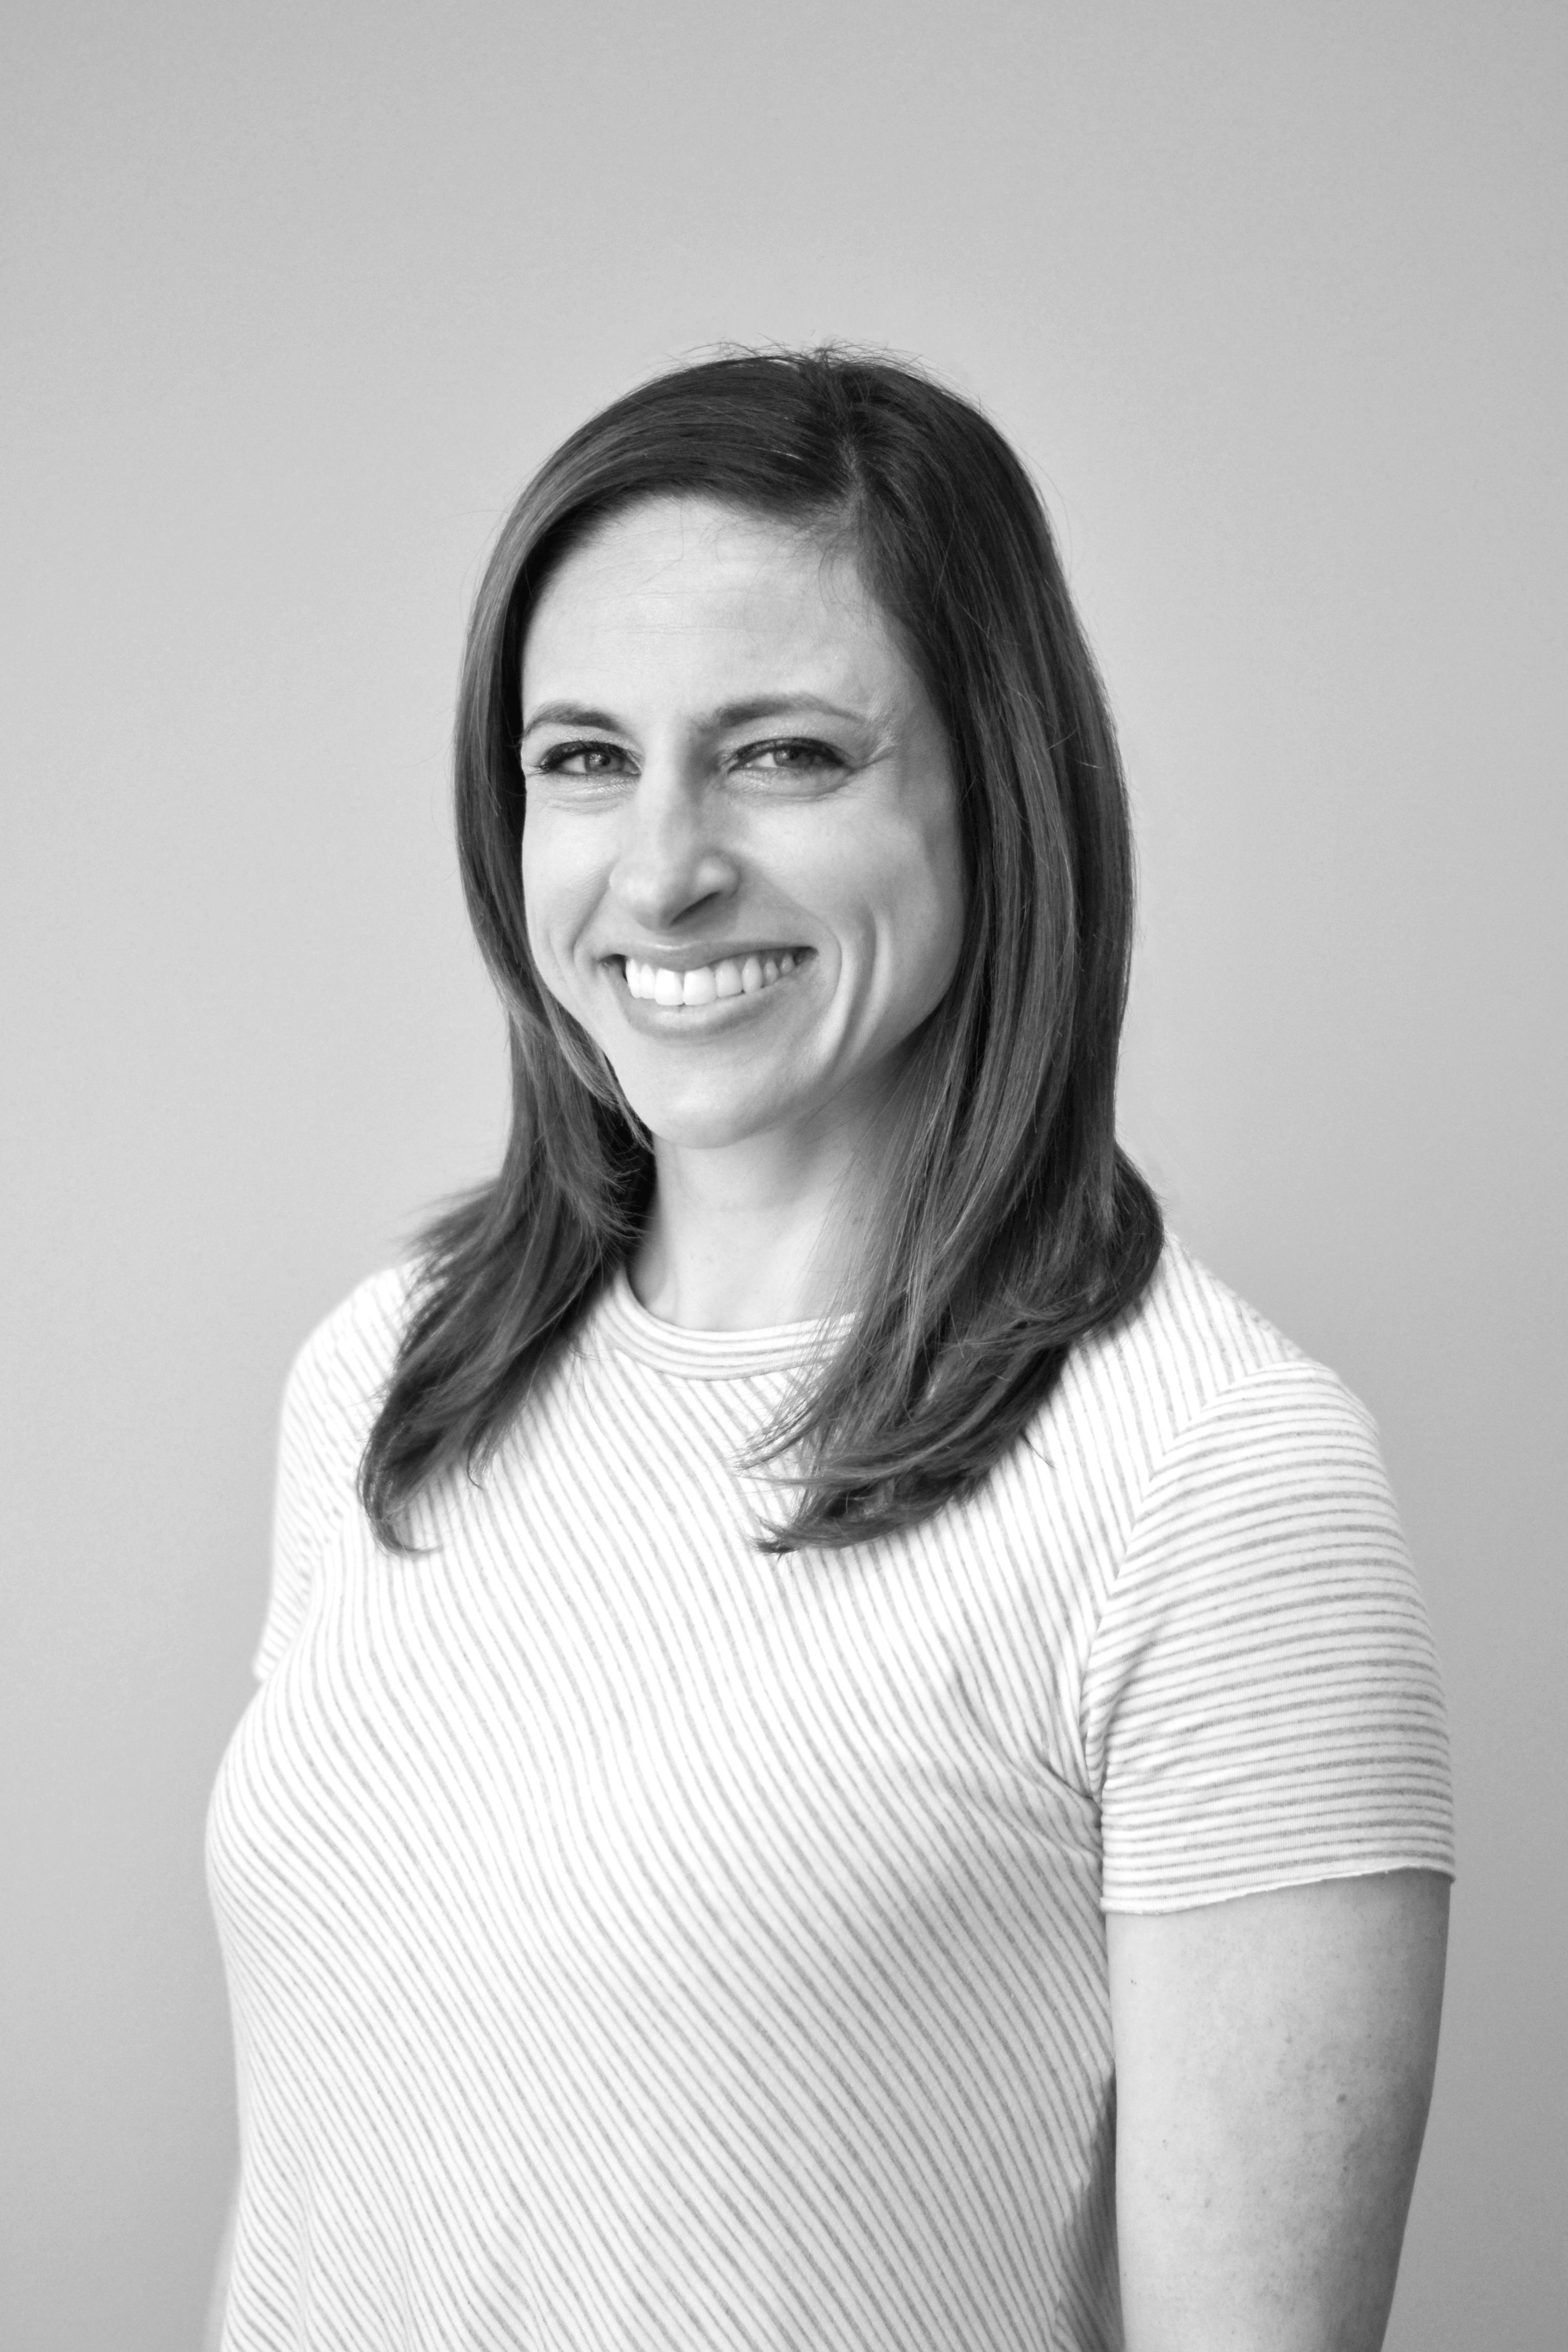 JF&CS Welcomes Lauren Rovick As New Child & Adolescent Therapist